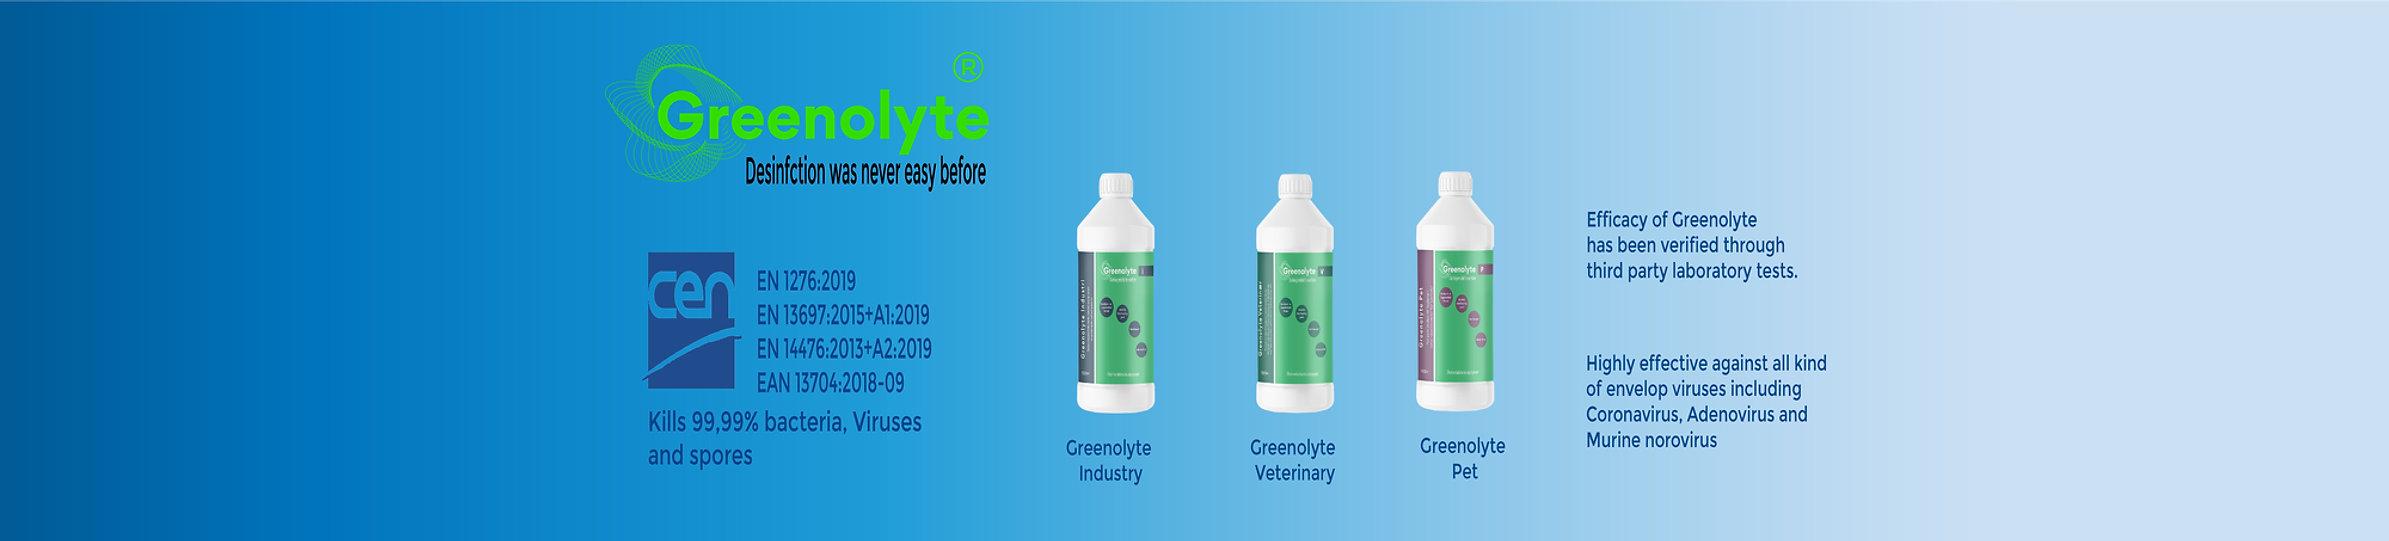 Products Greenolyte 99999999-01.jpg